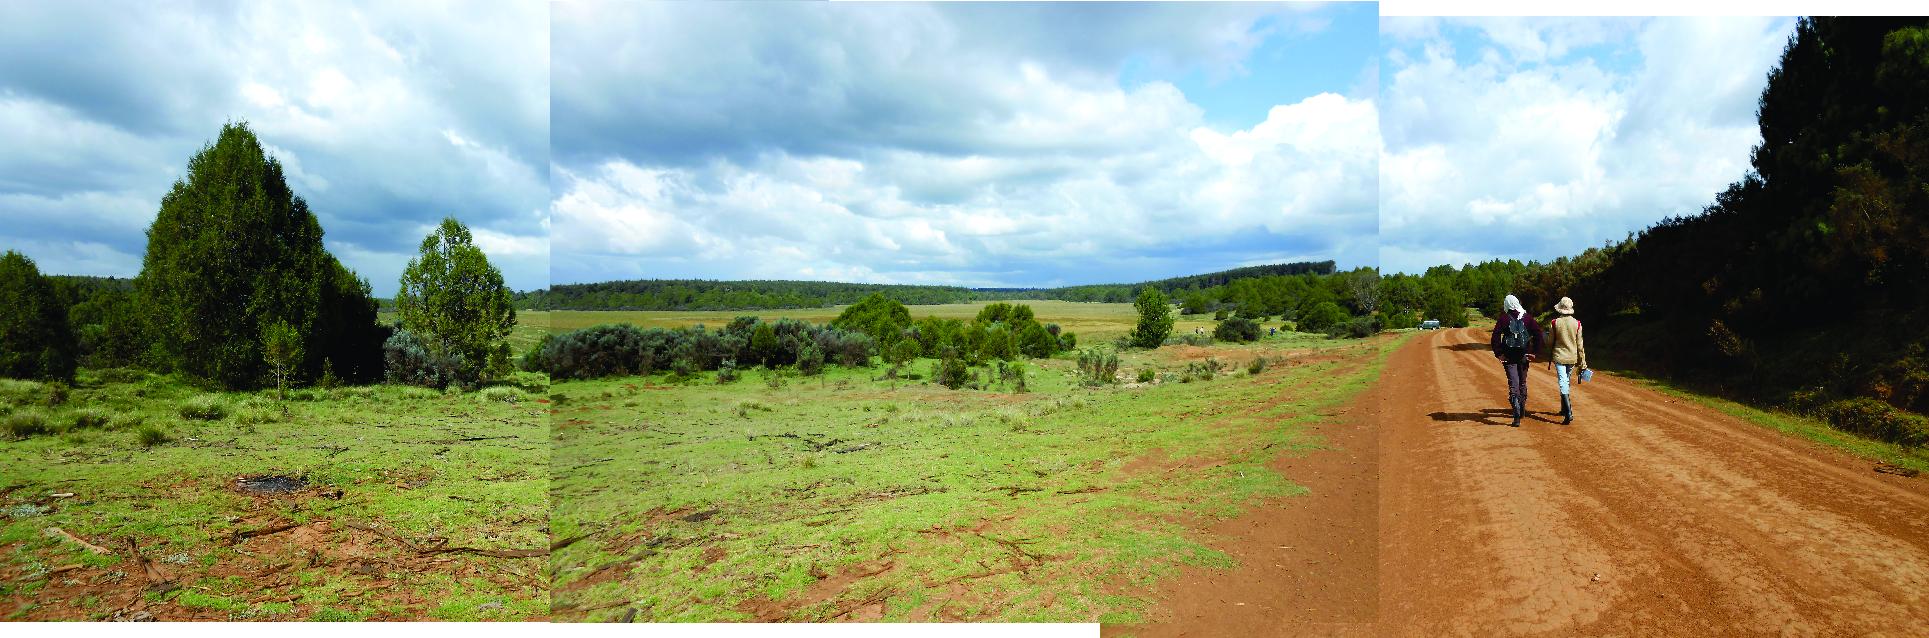 Nyabuiyabui panorama 001